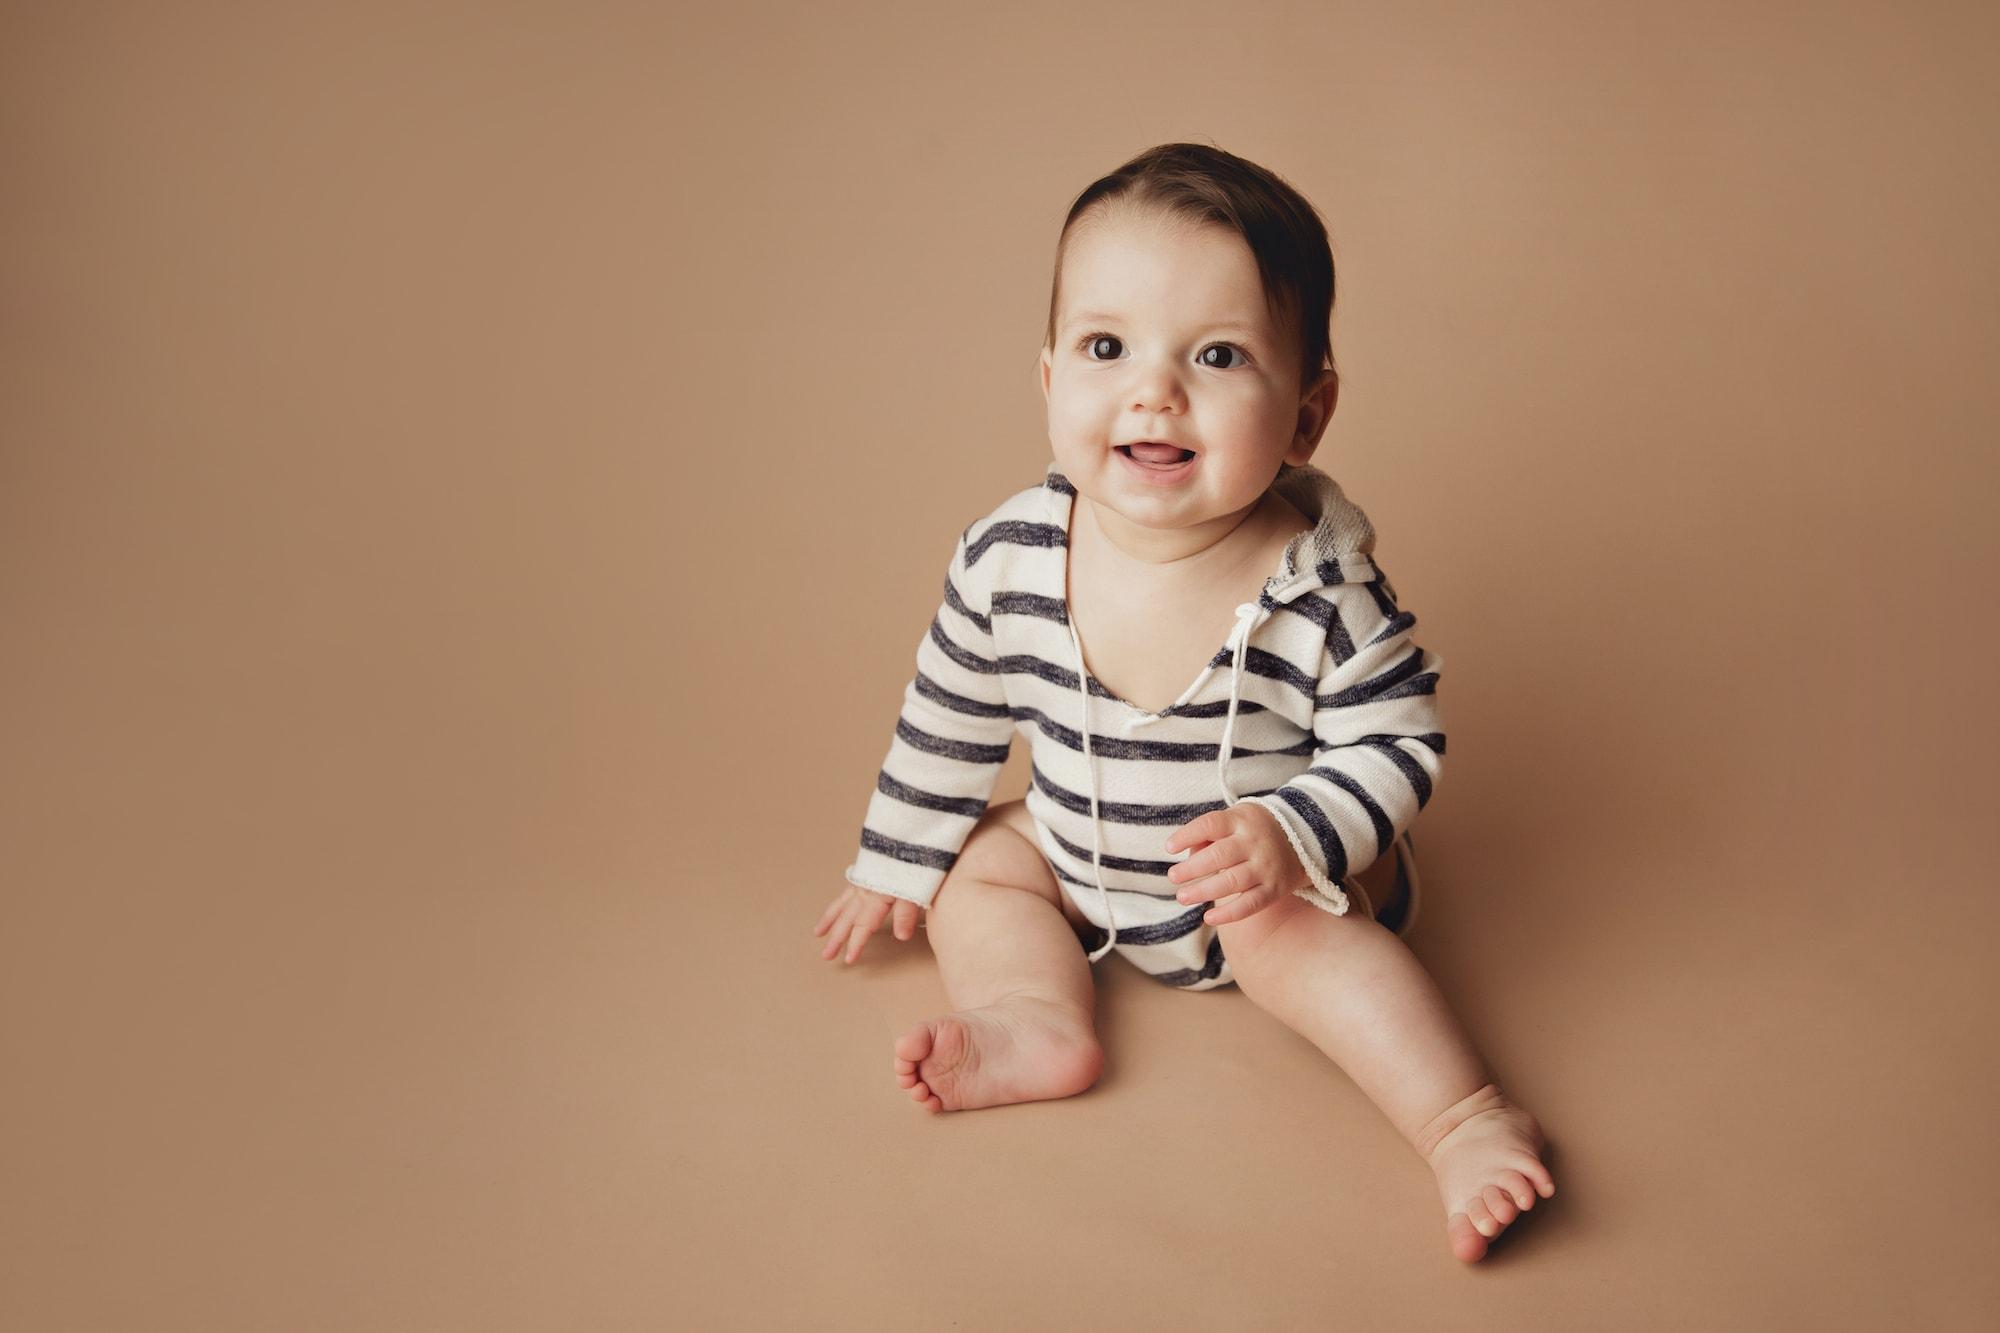 Baby in striped onesie